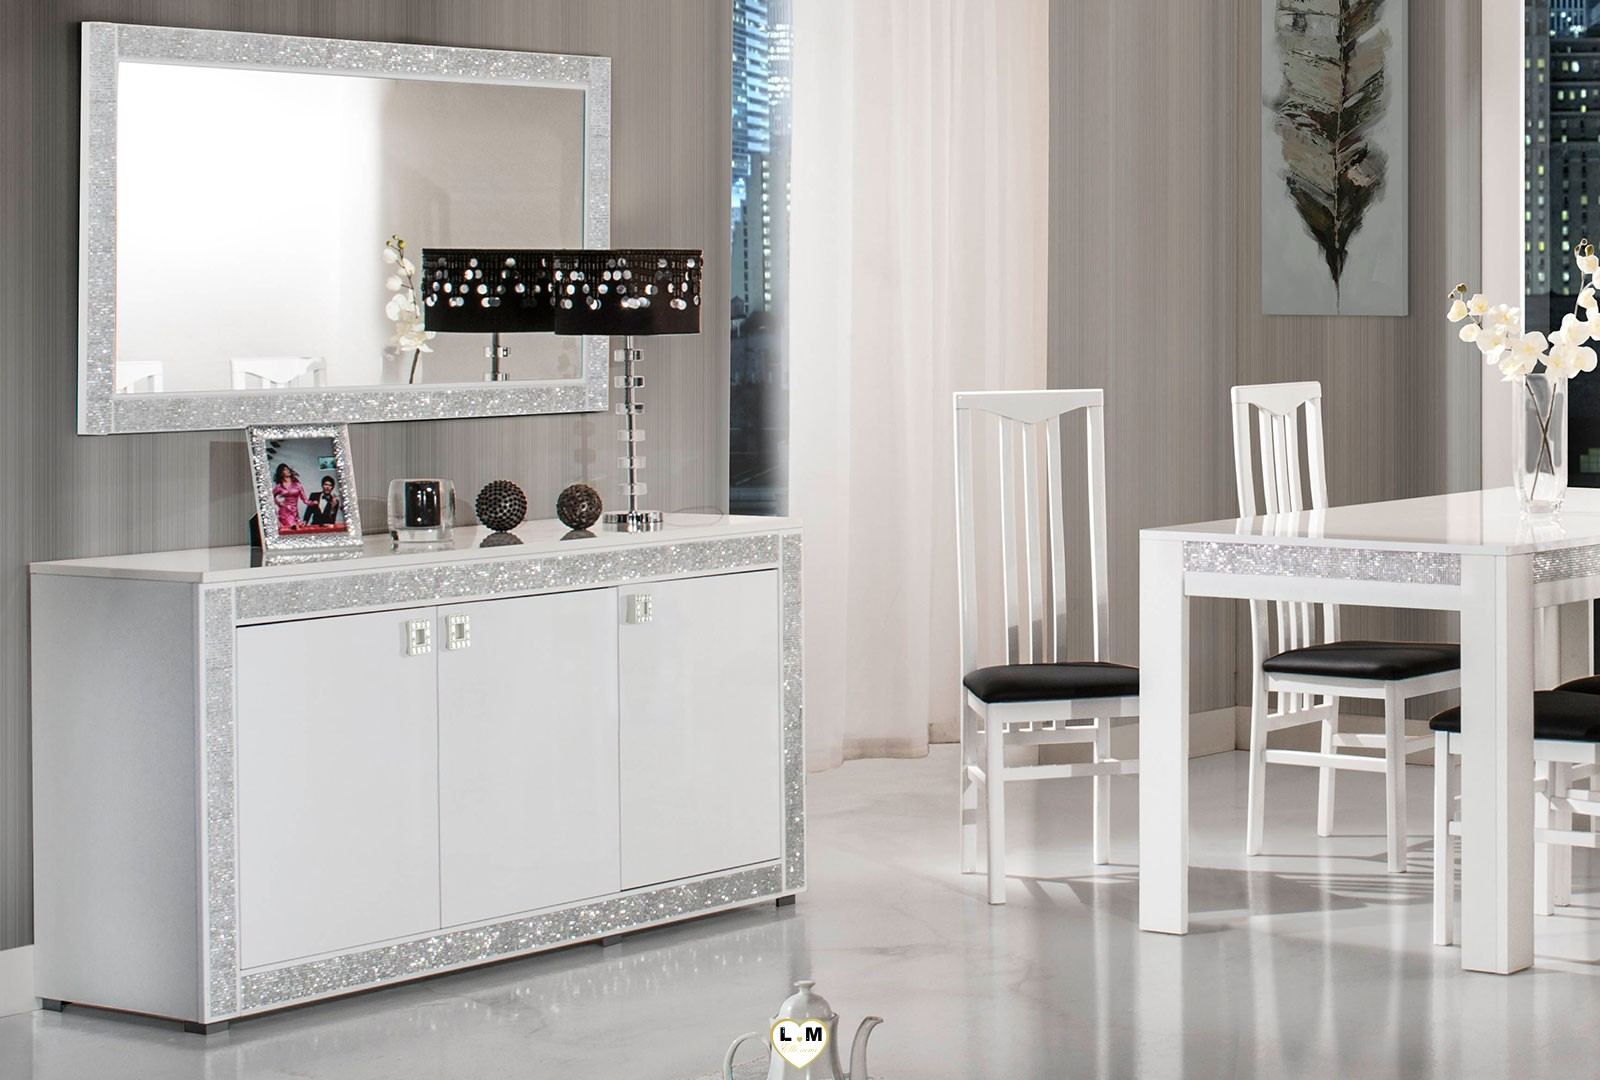 Glamour laque blanc sejour salle a manger design le - Salle a manger blanc laque pas cher ...